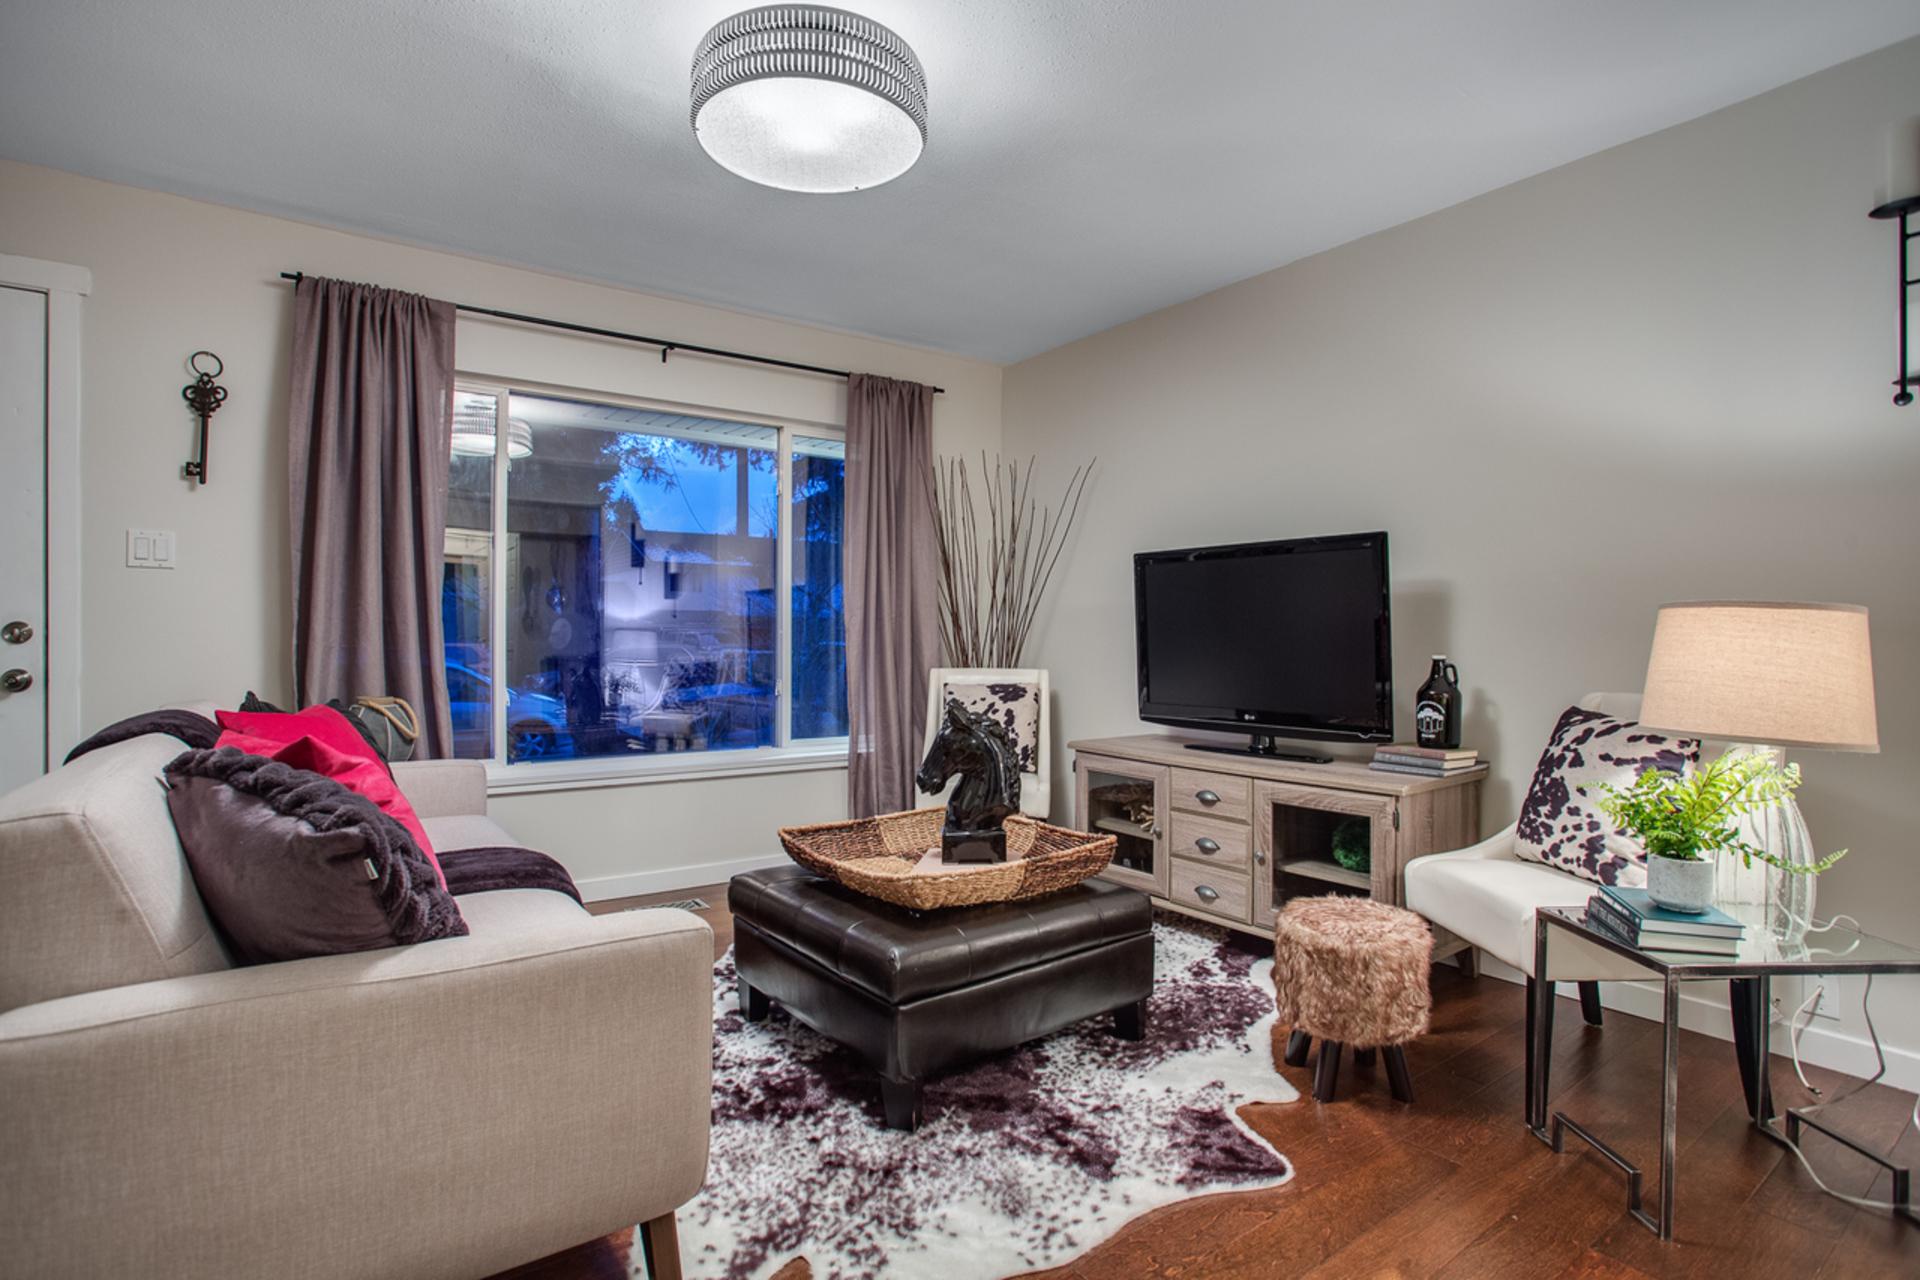 3274-wellingtion-street-port-coquitlam-360hometours-03s at 3274 Wellington Street, Glenwood PQ, Port Coquitlam